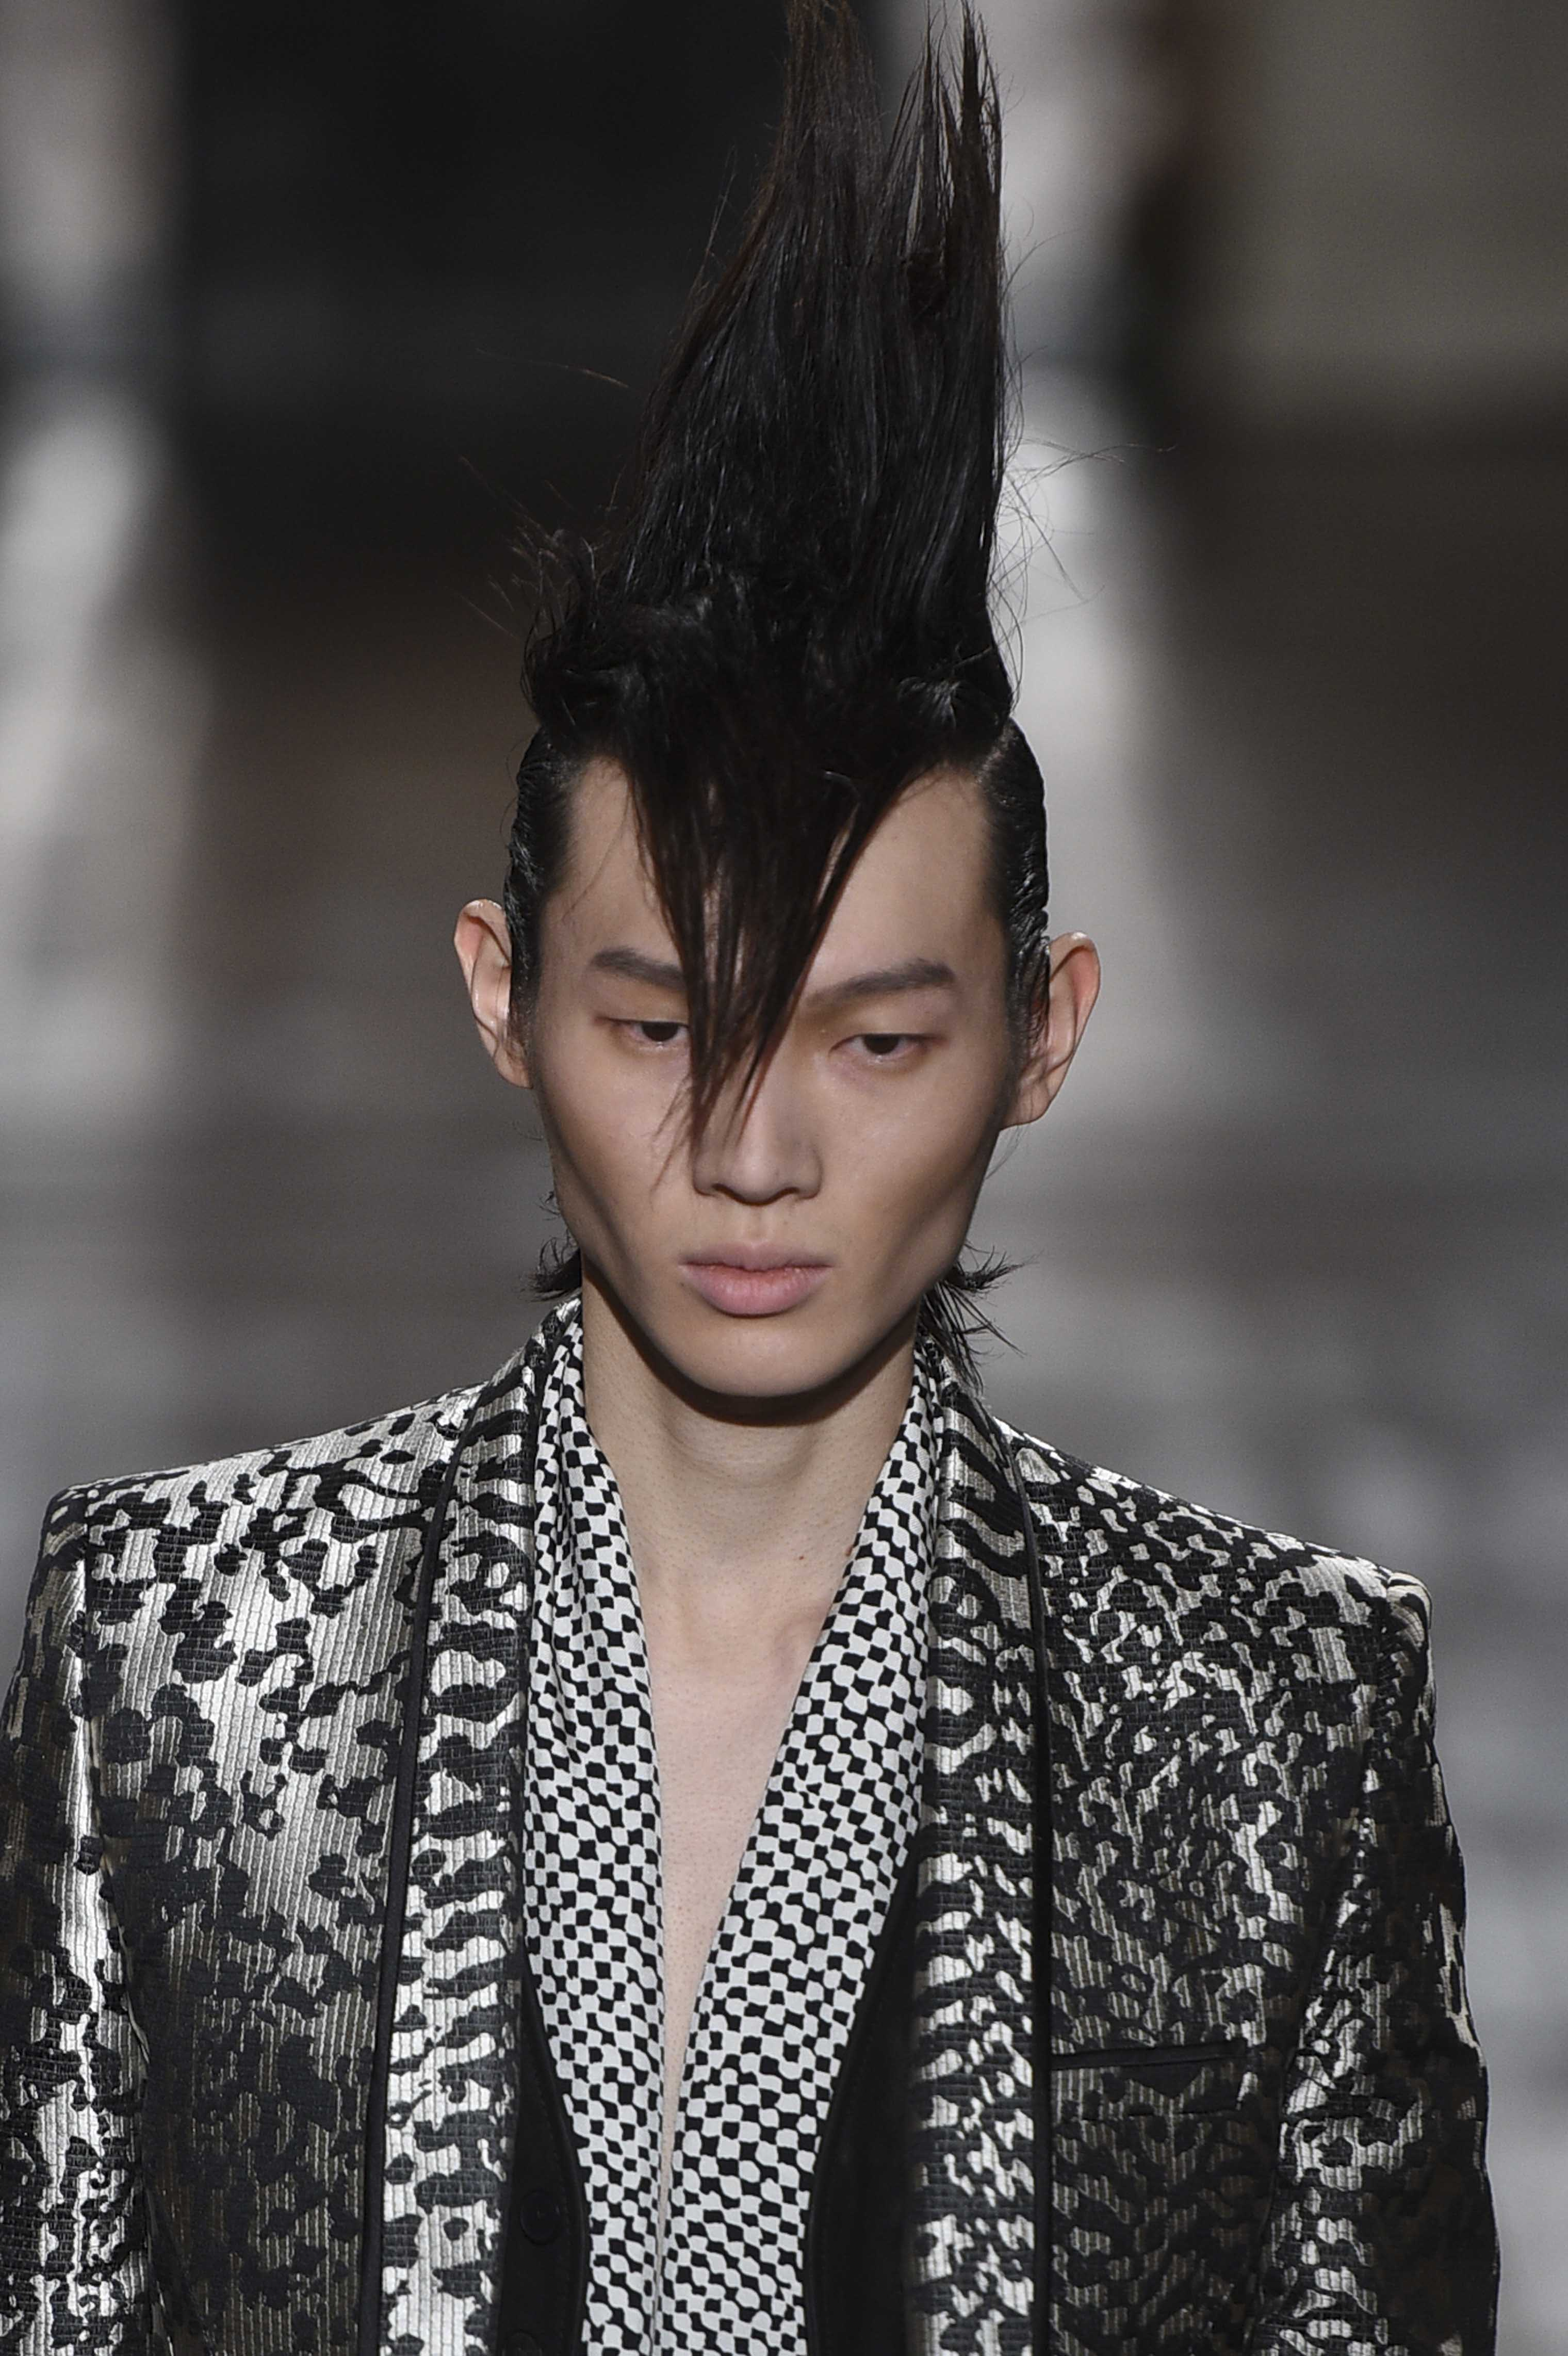 Swell Punk Hairstyles For Men 3 Super Easy Halloween Ideas Short Hairstyles For Black Women Fulllsitofus